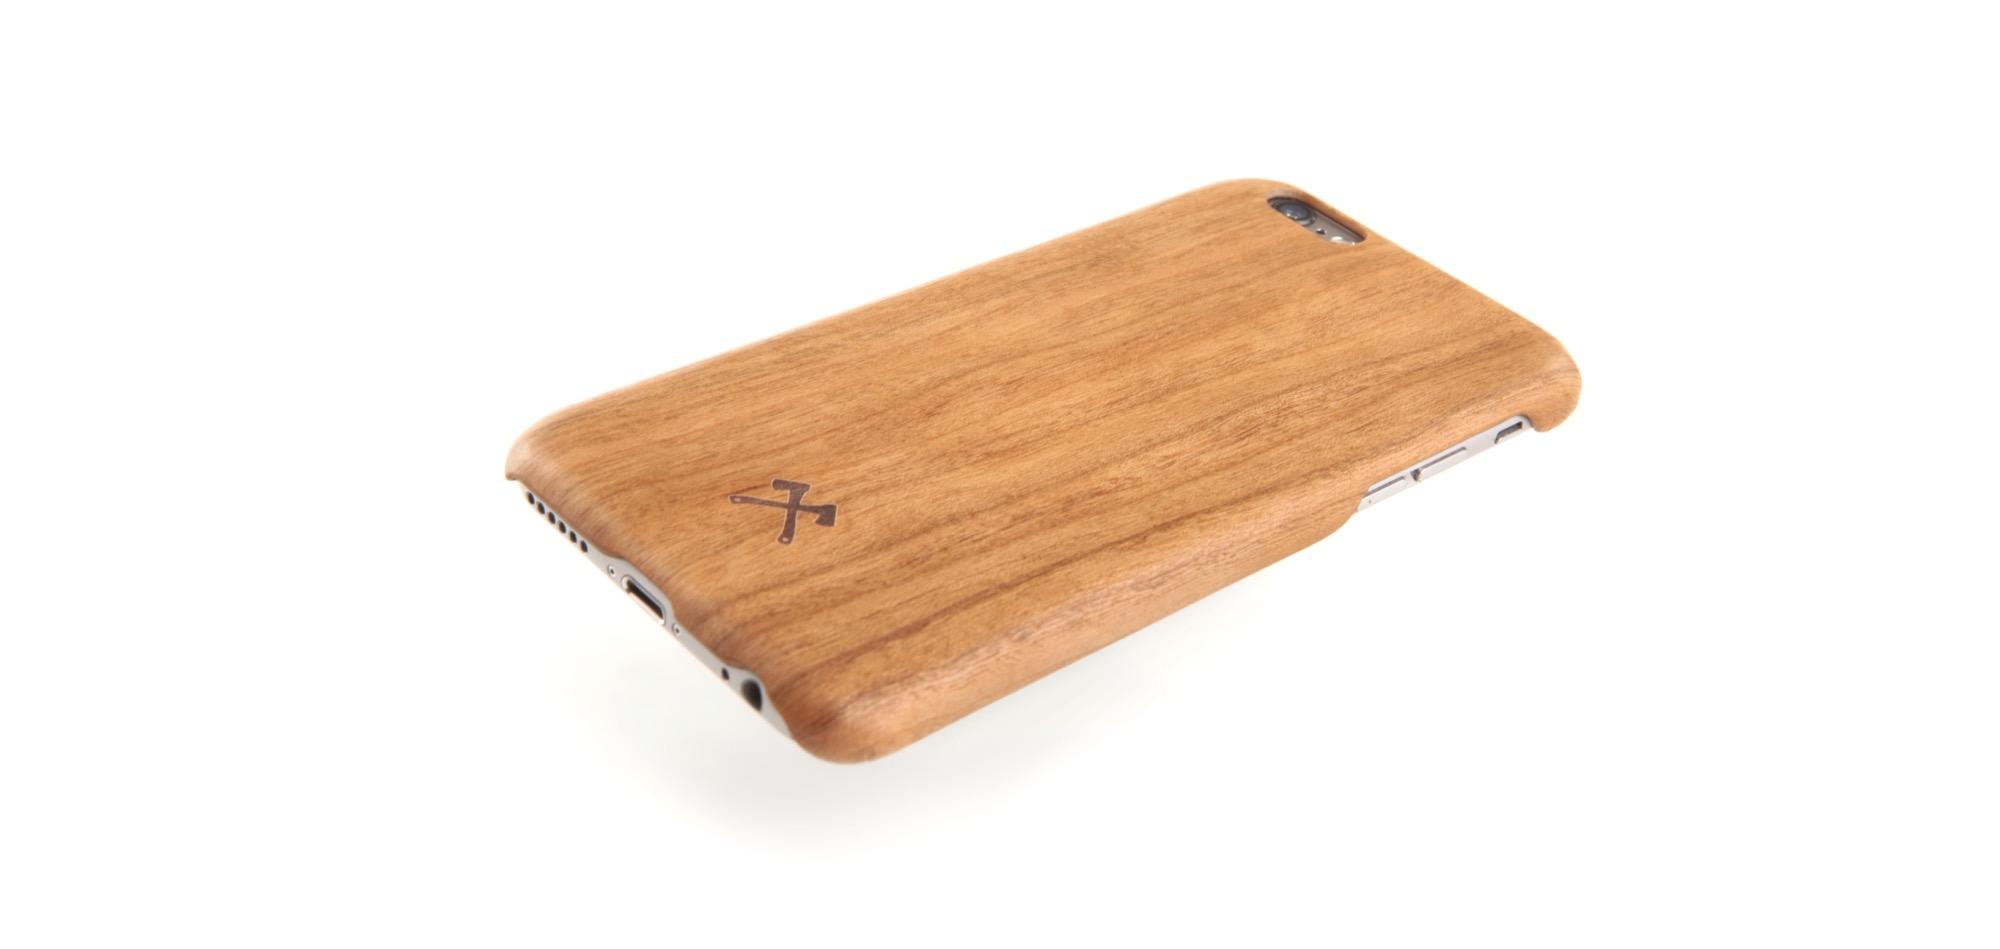 kevlar-holz-iphone-7-case-holzcase-huelle-schlank-wood-duenn-leicht-schutzhuelle-schutz-stabilfolie4